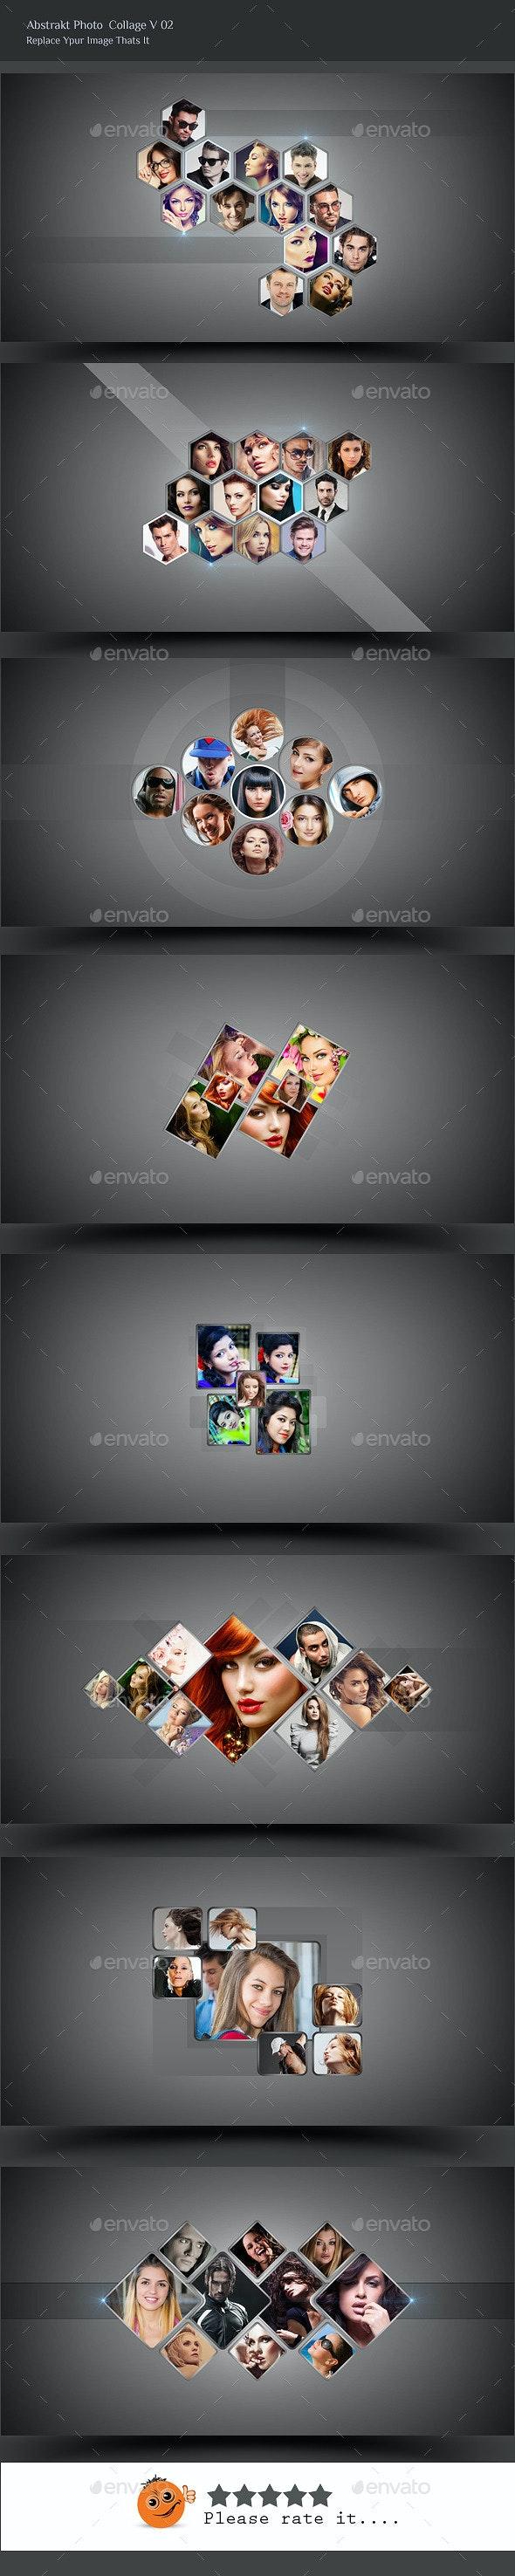 Abstrakt Photo Collage V02 - Photo Templates Graphics